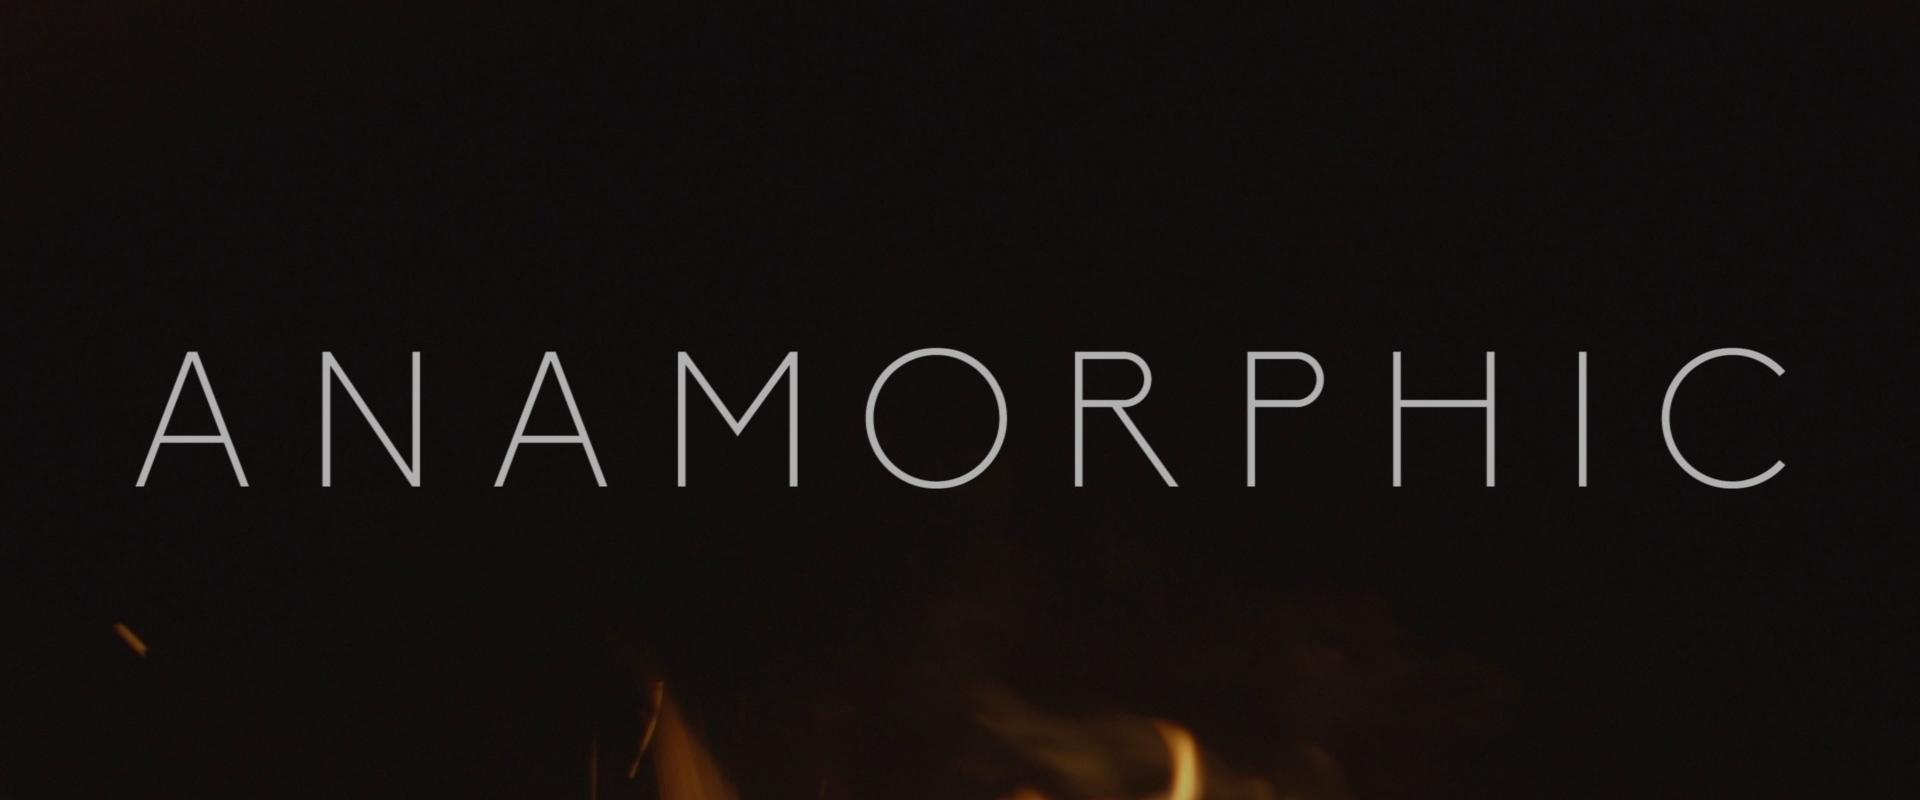 Anamorphic Reel